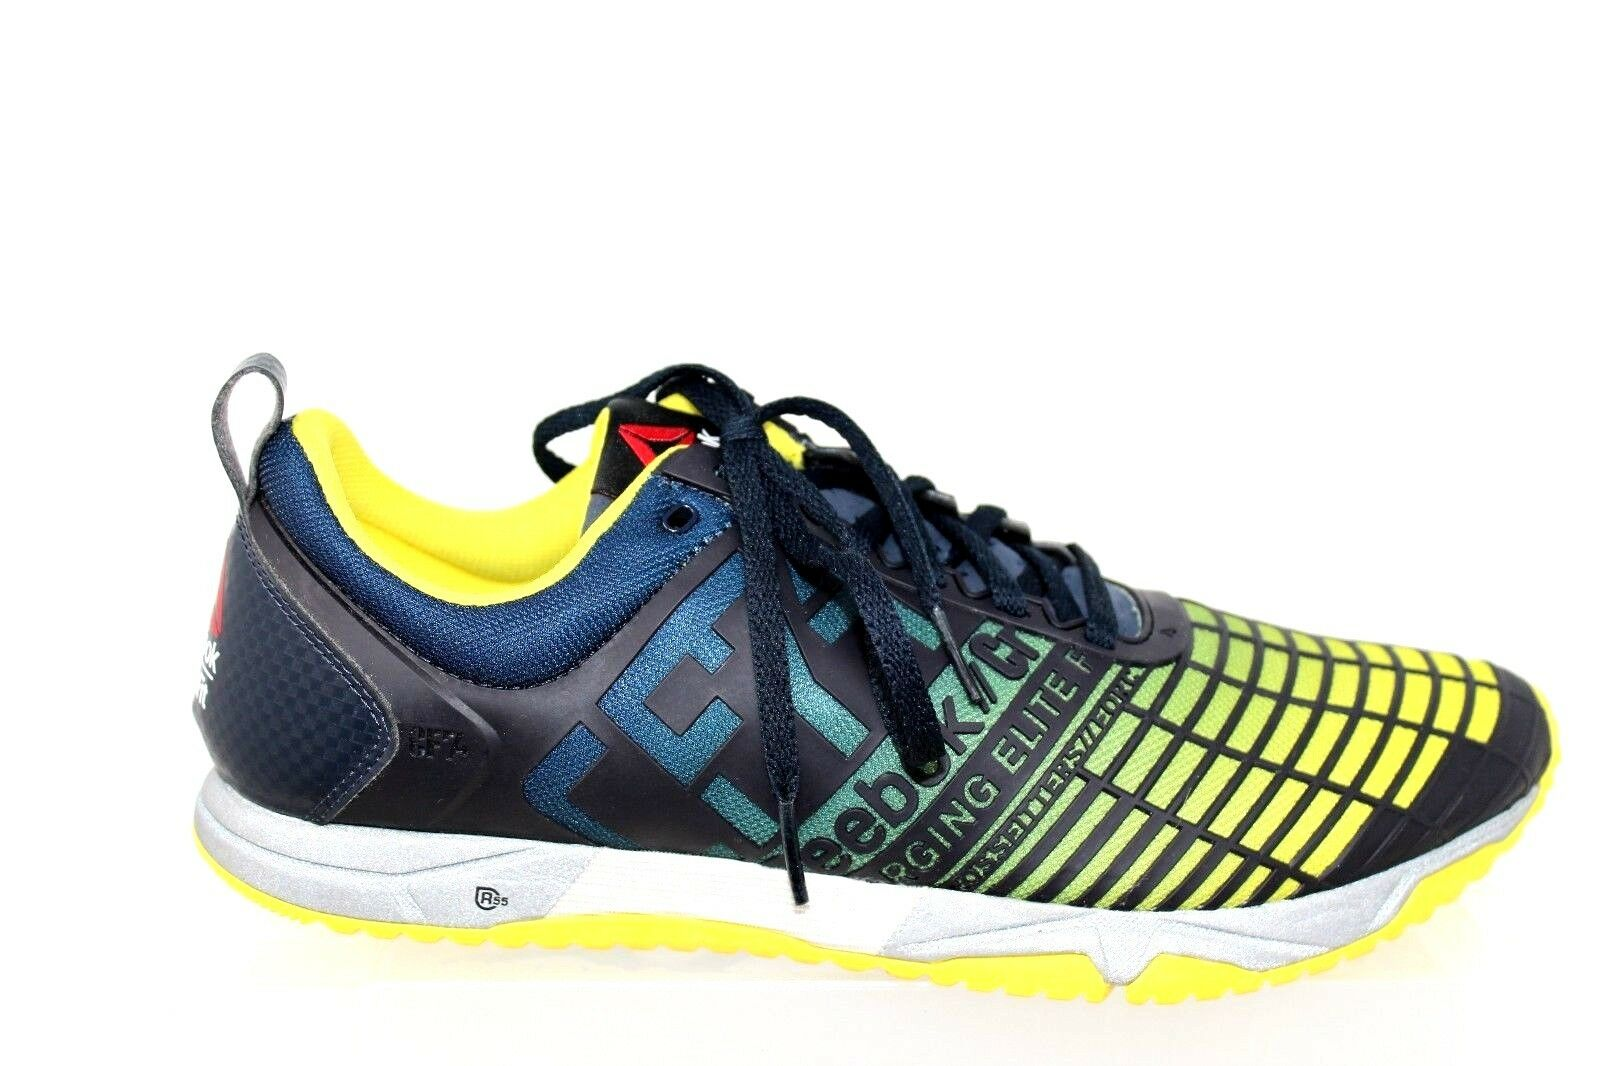 Reebok Cross Fit Sprint TR Training shoes Reebok Navy Stinger Yellow Mens Size 9